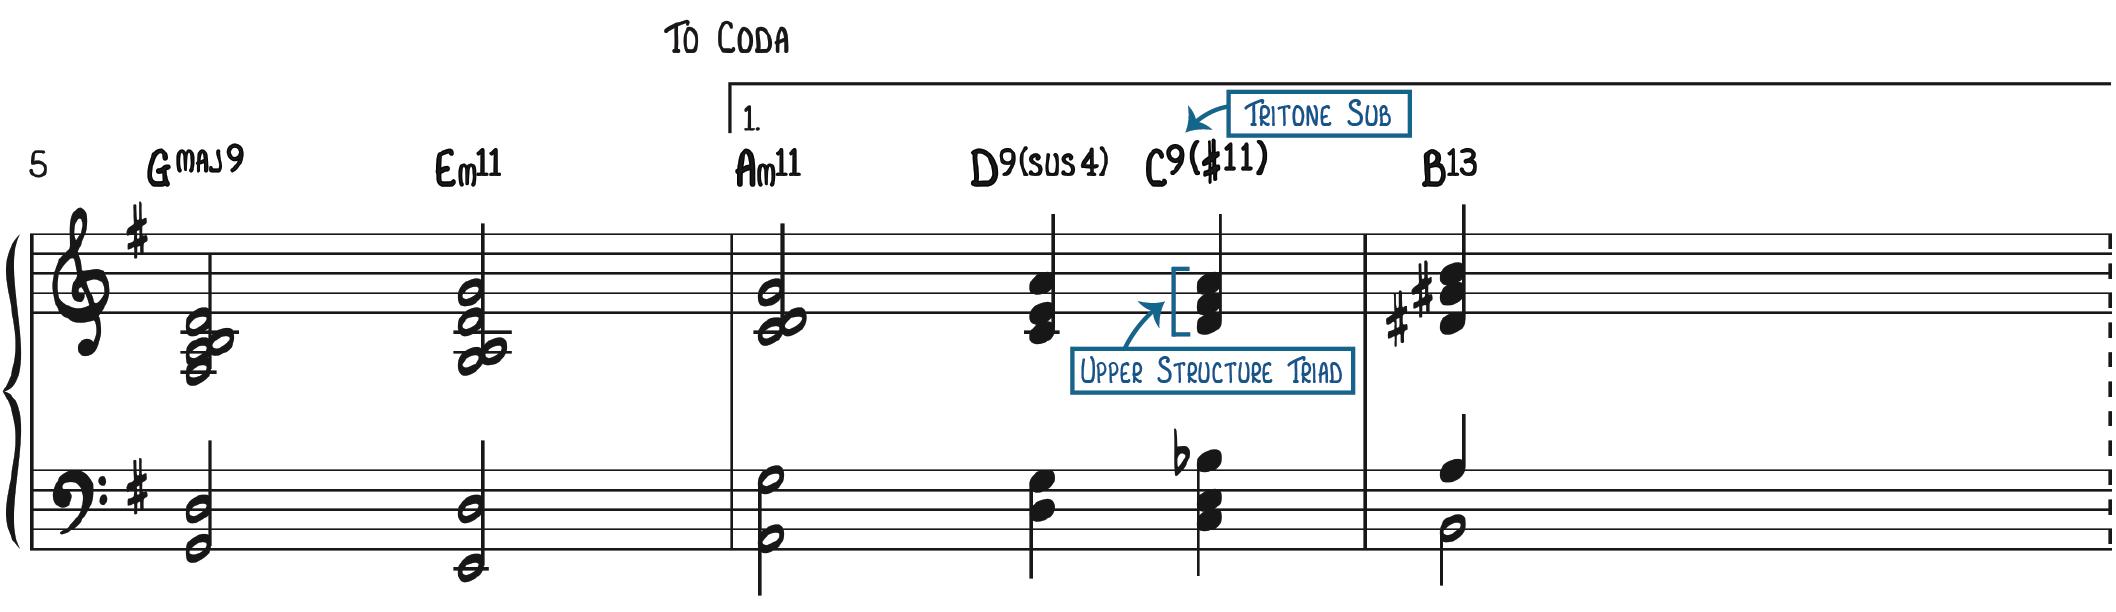 1st Ending Tritone Sub & Upper Structure Triad